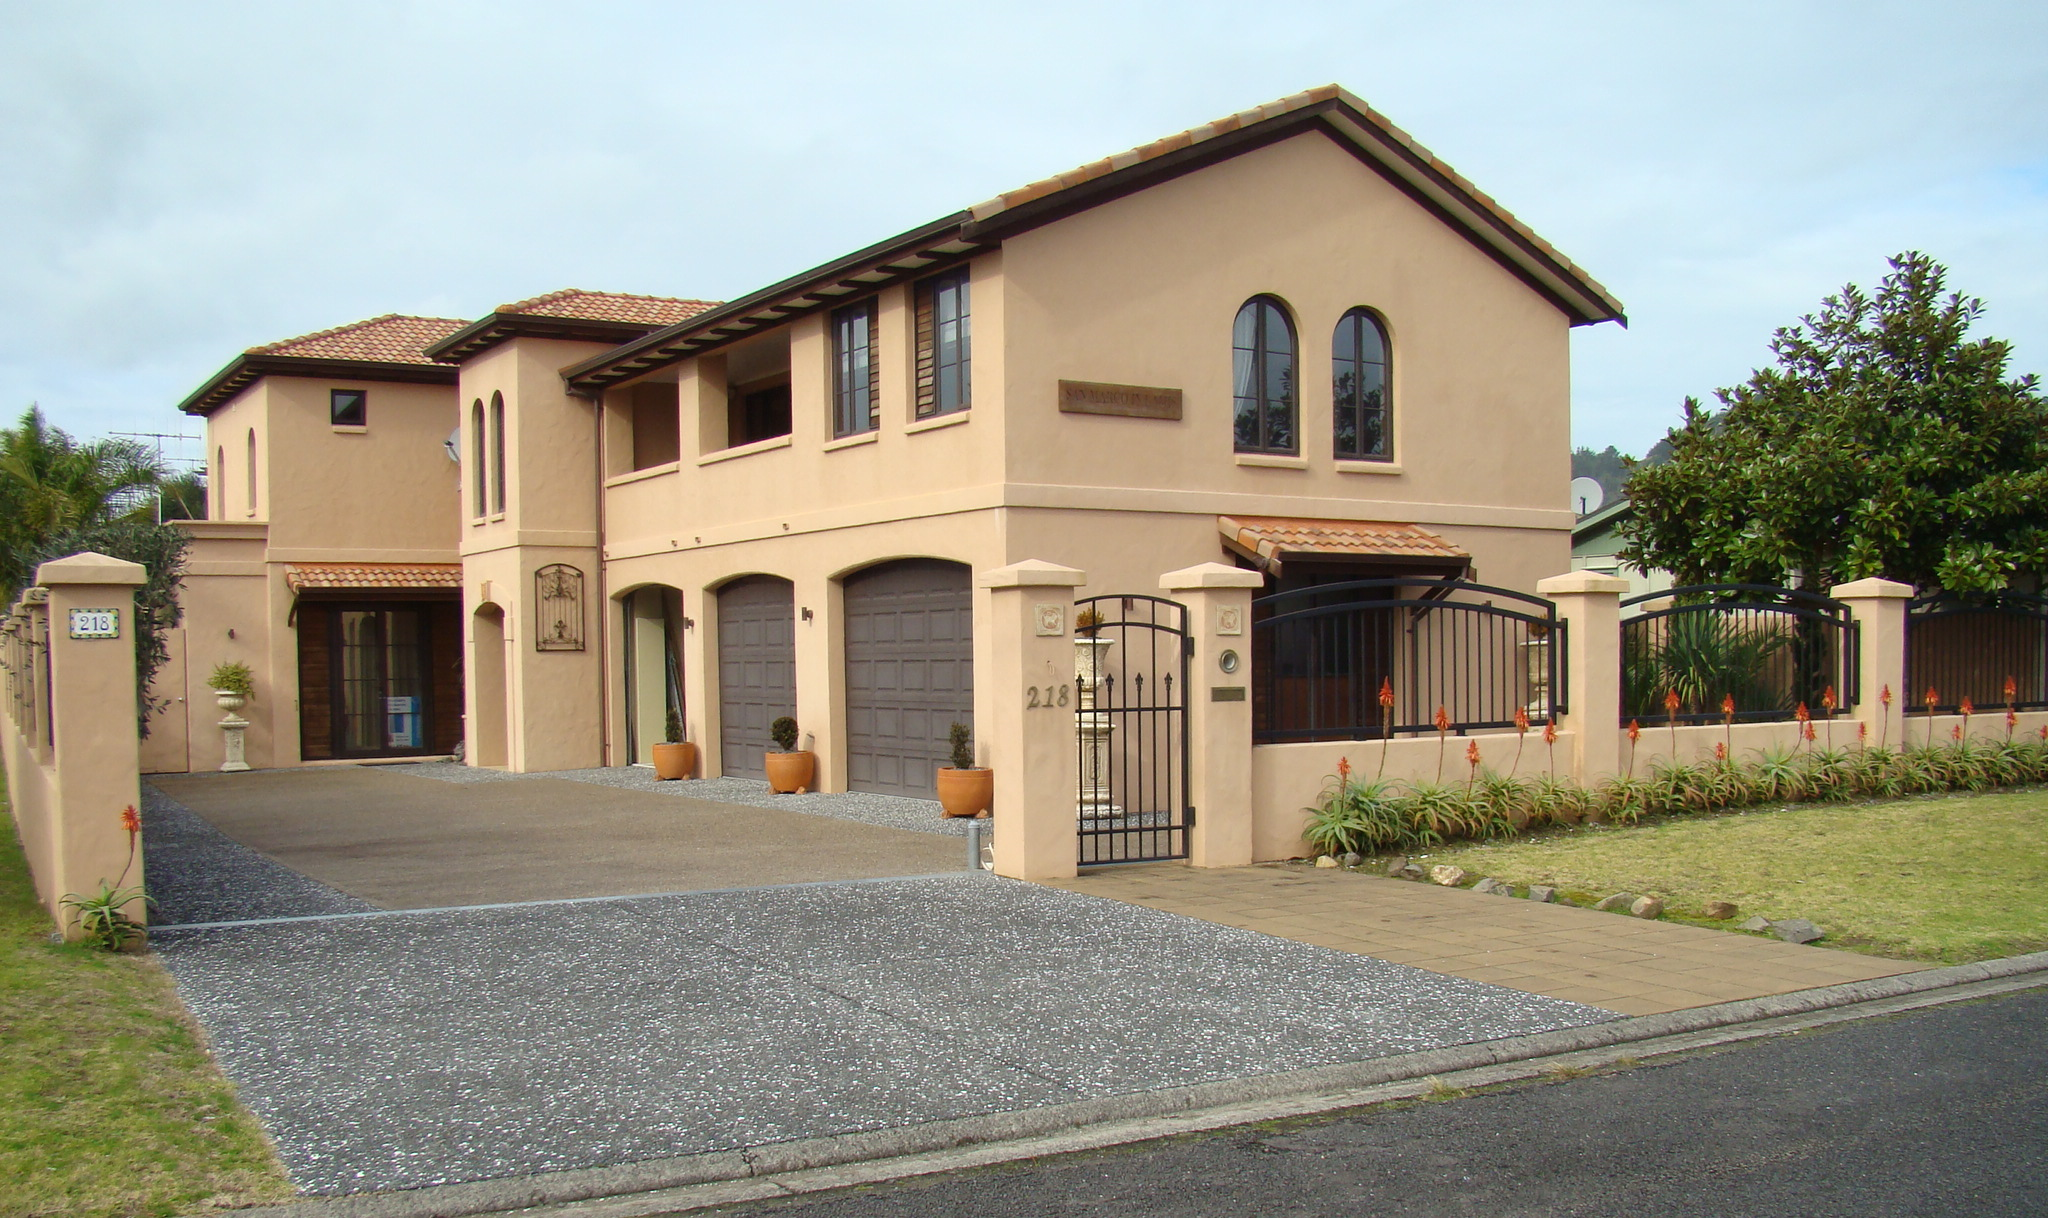 Vente maison de campagne whangamata coromandel nouvelle - La villa rahimona en nouvelle zelande ...